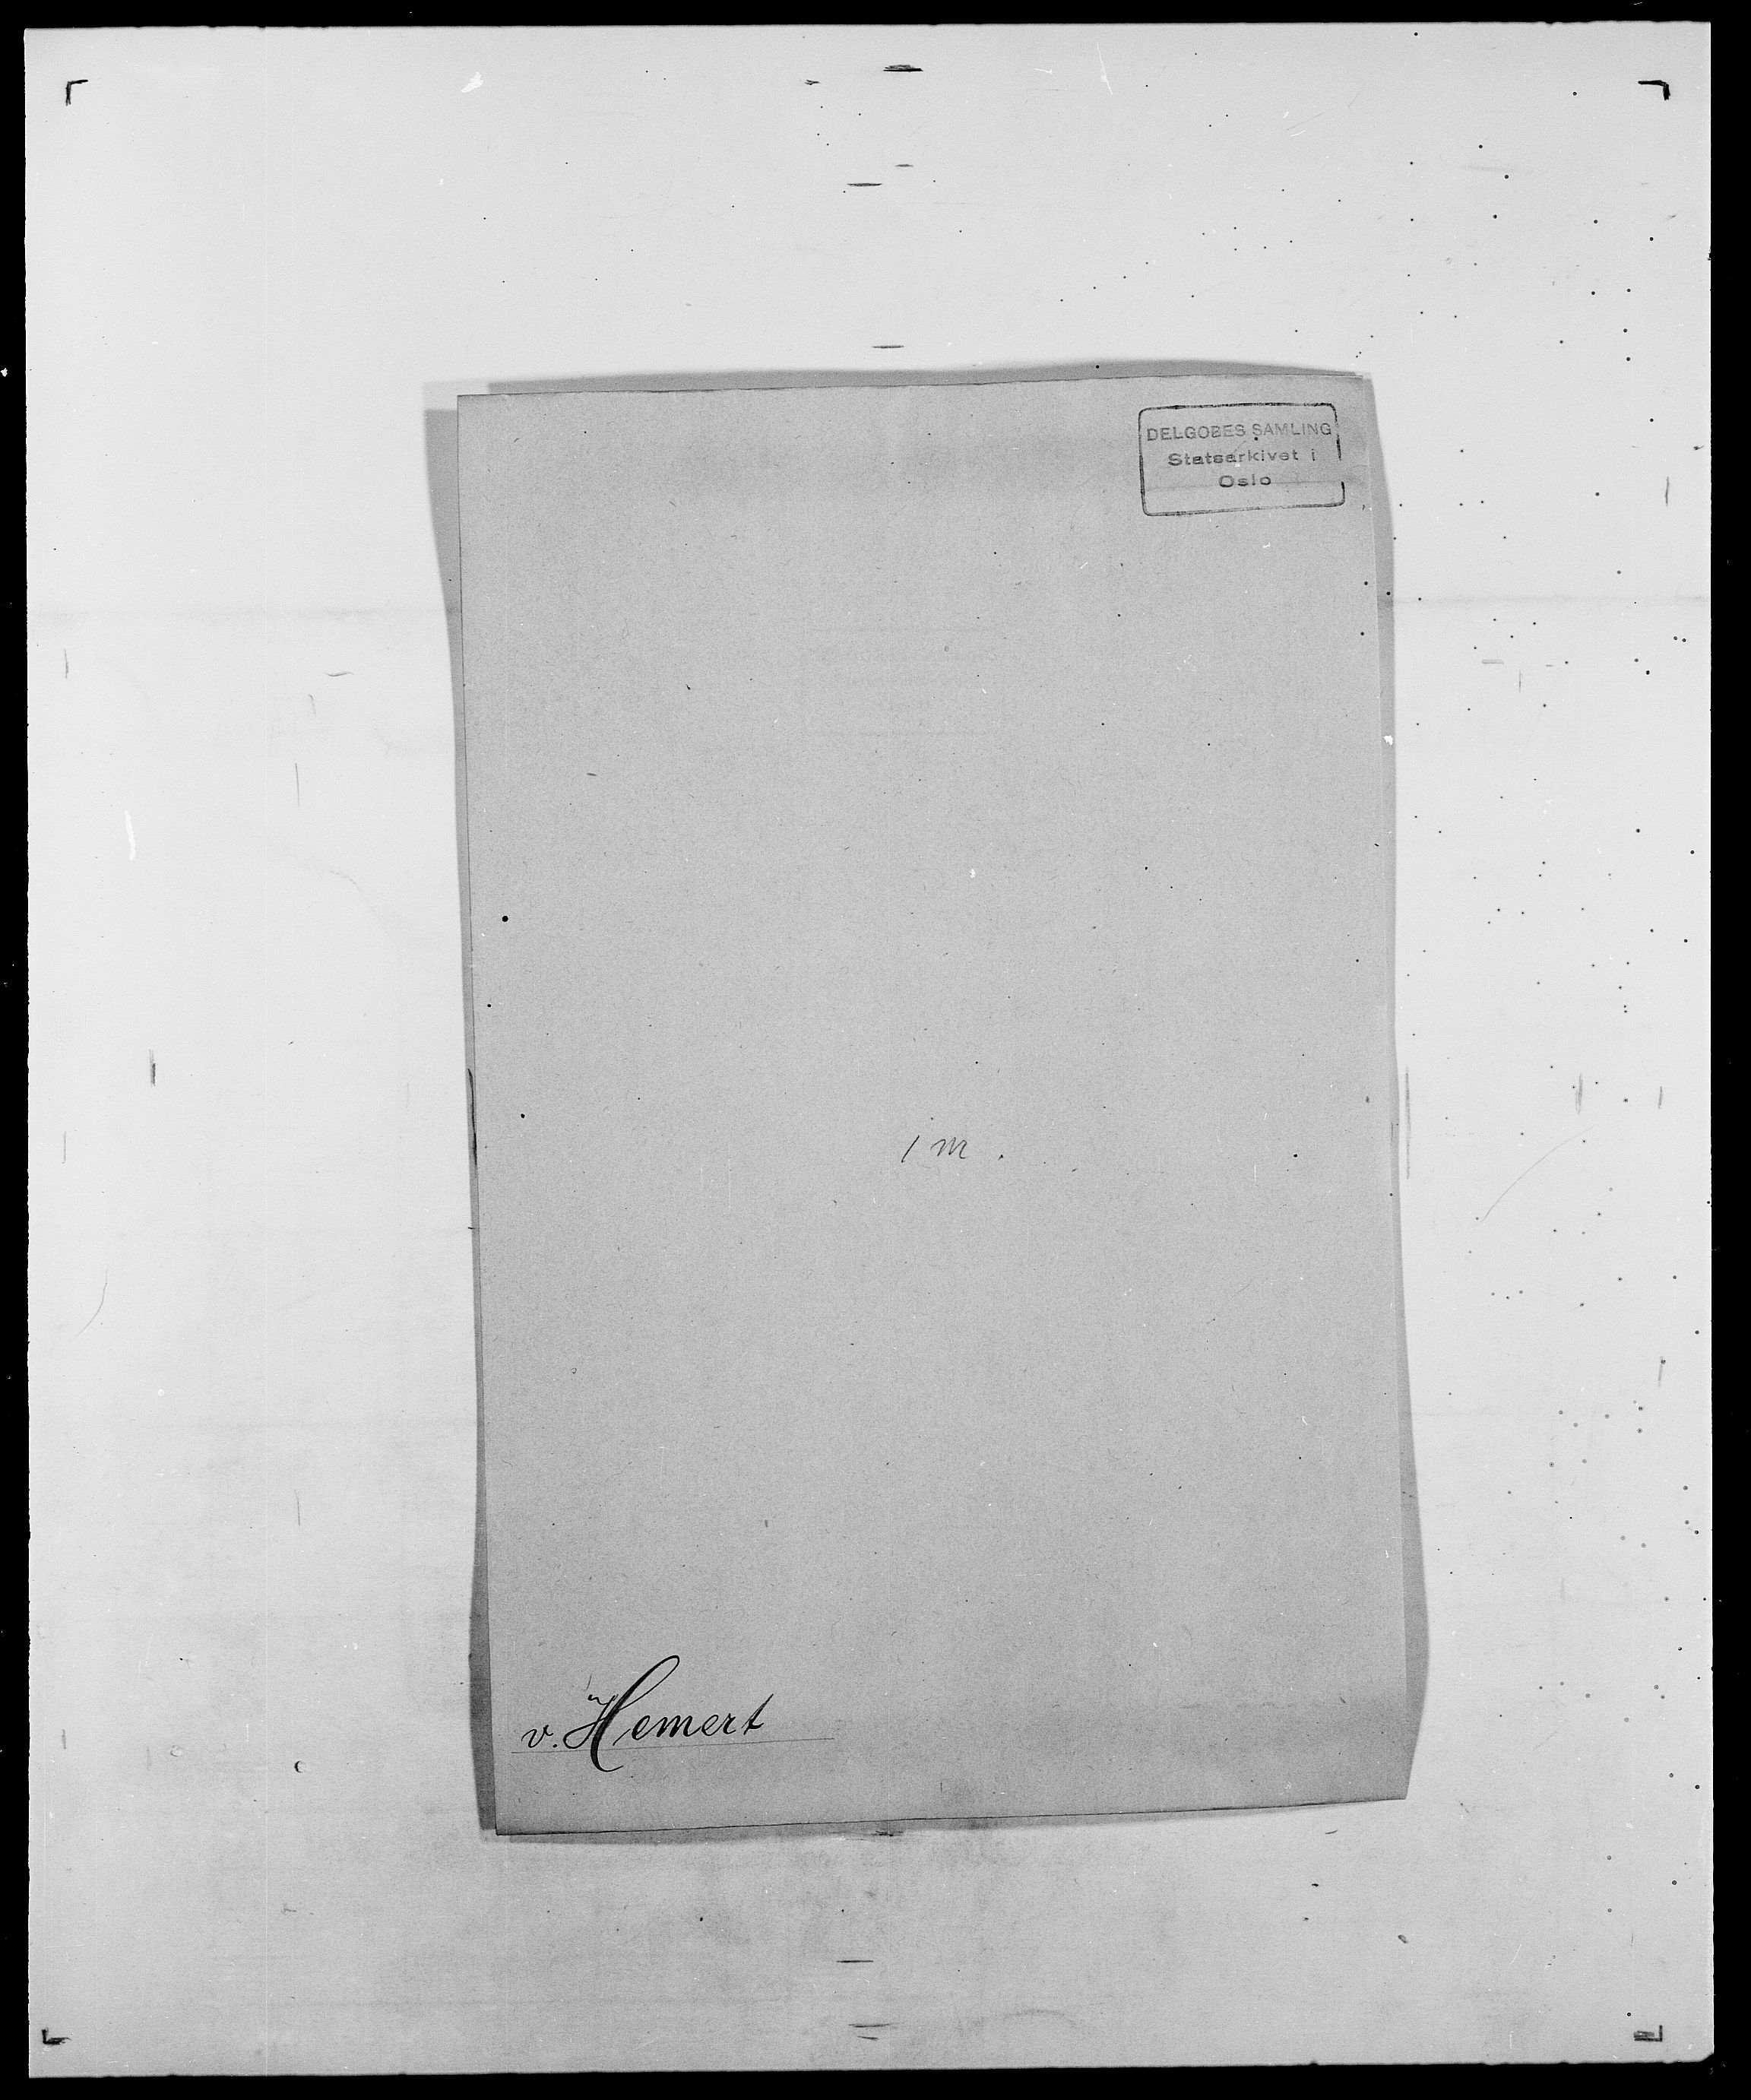 SAO, Delgobe, Charles Antoine - samling, D/Da/L0017: Helander - Hjørne, s. 149